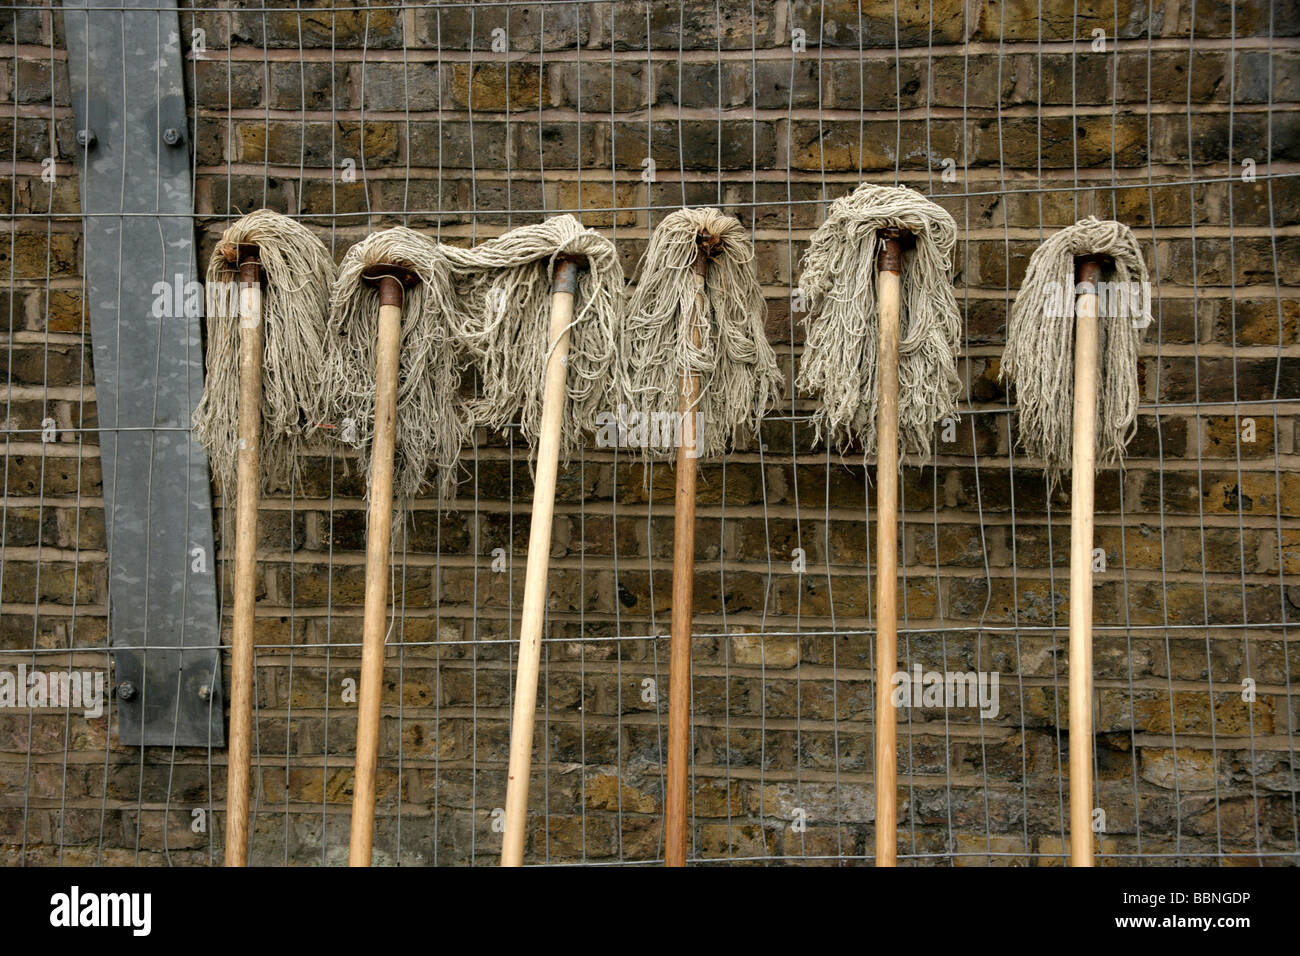 Six floor mops in a row, east London, UK - Stock Image